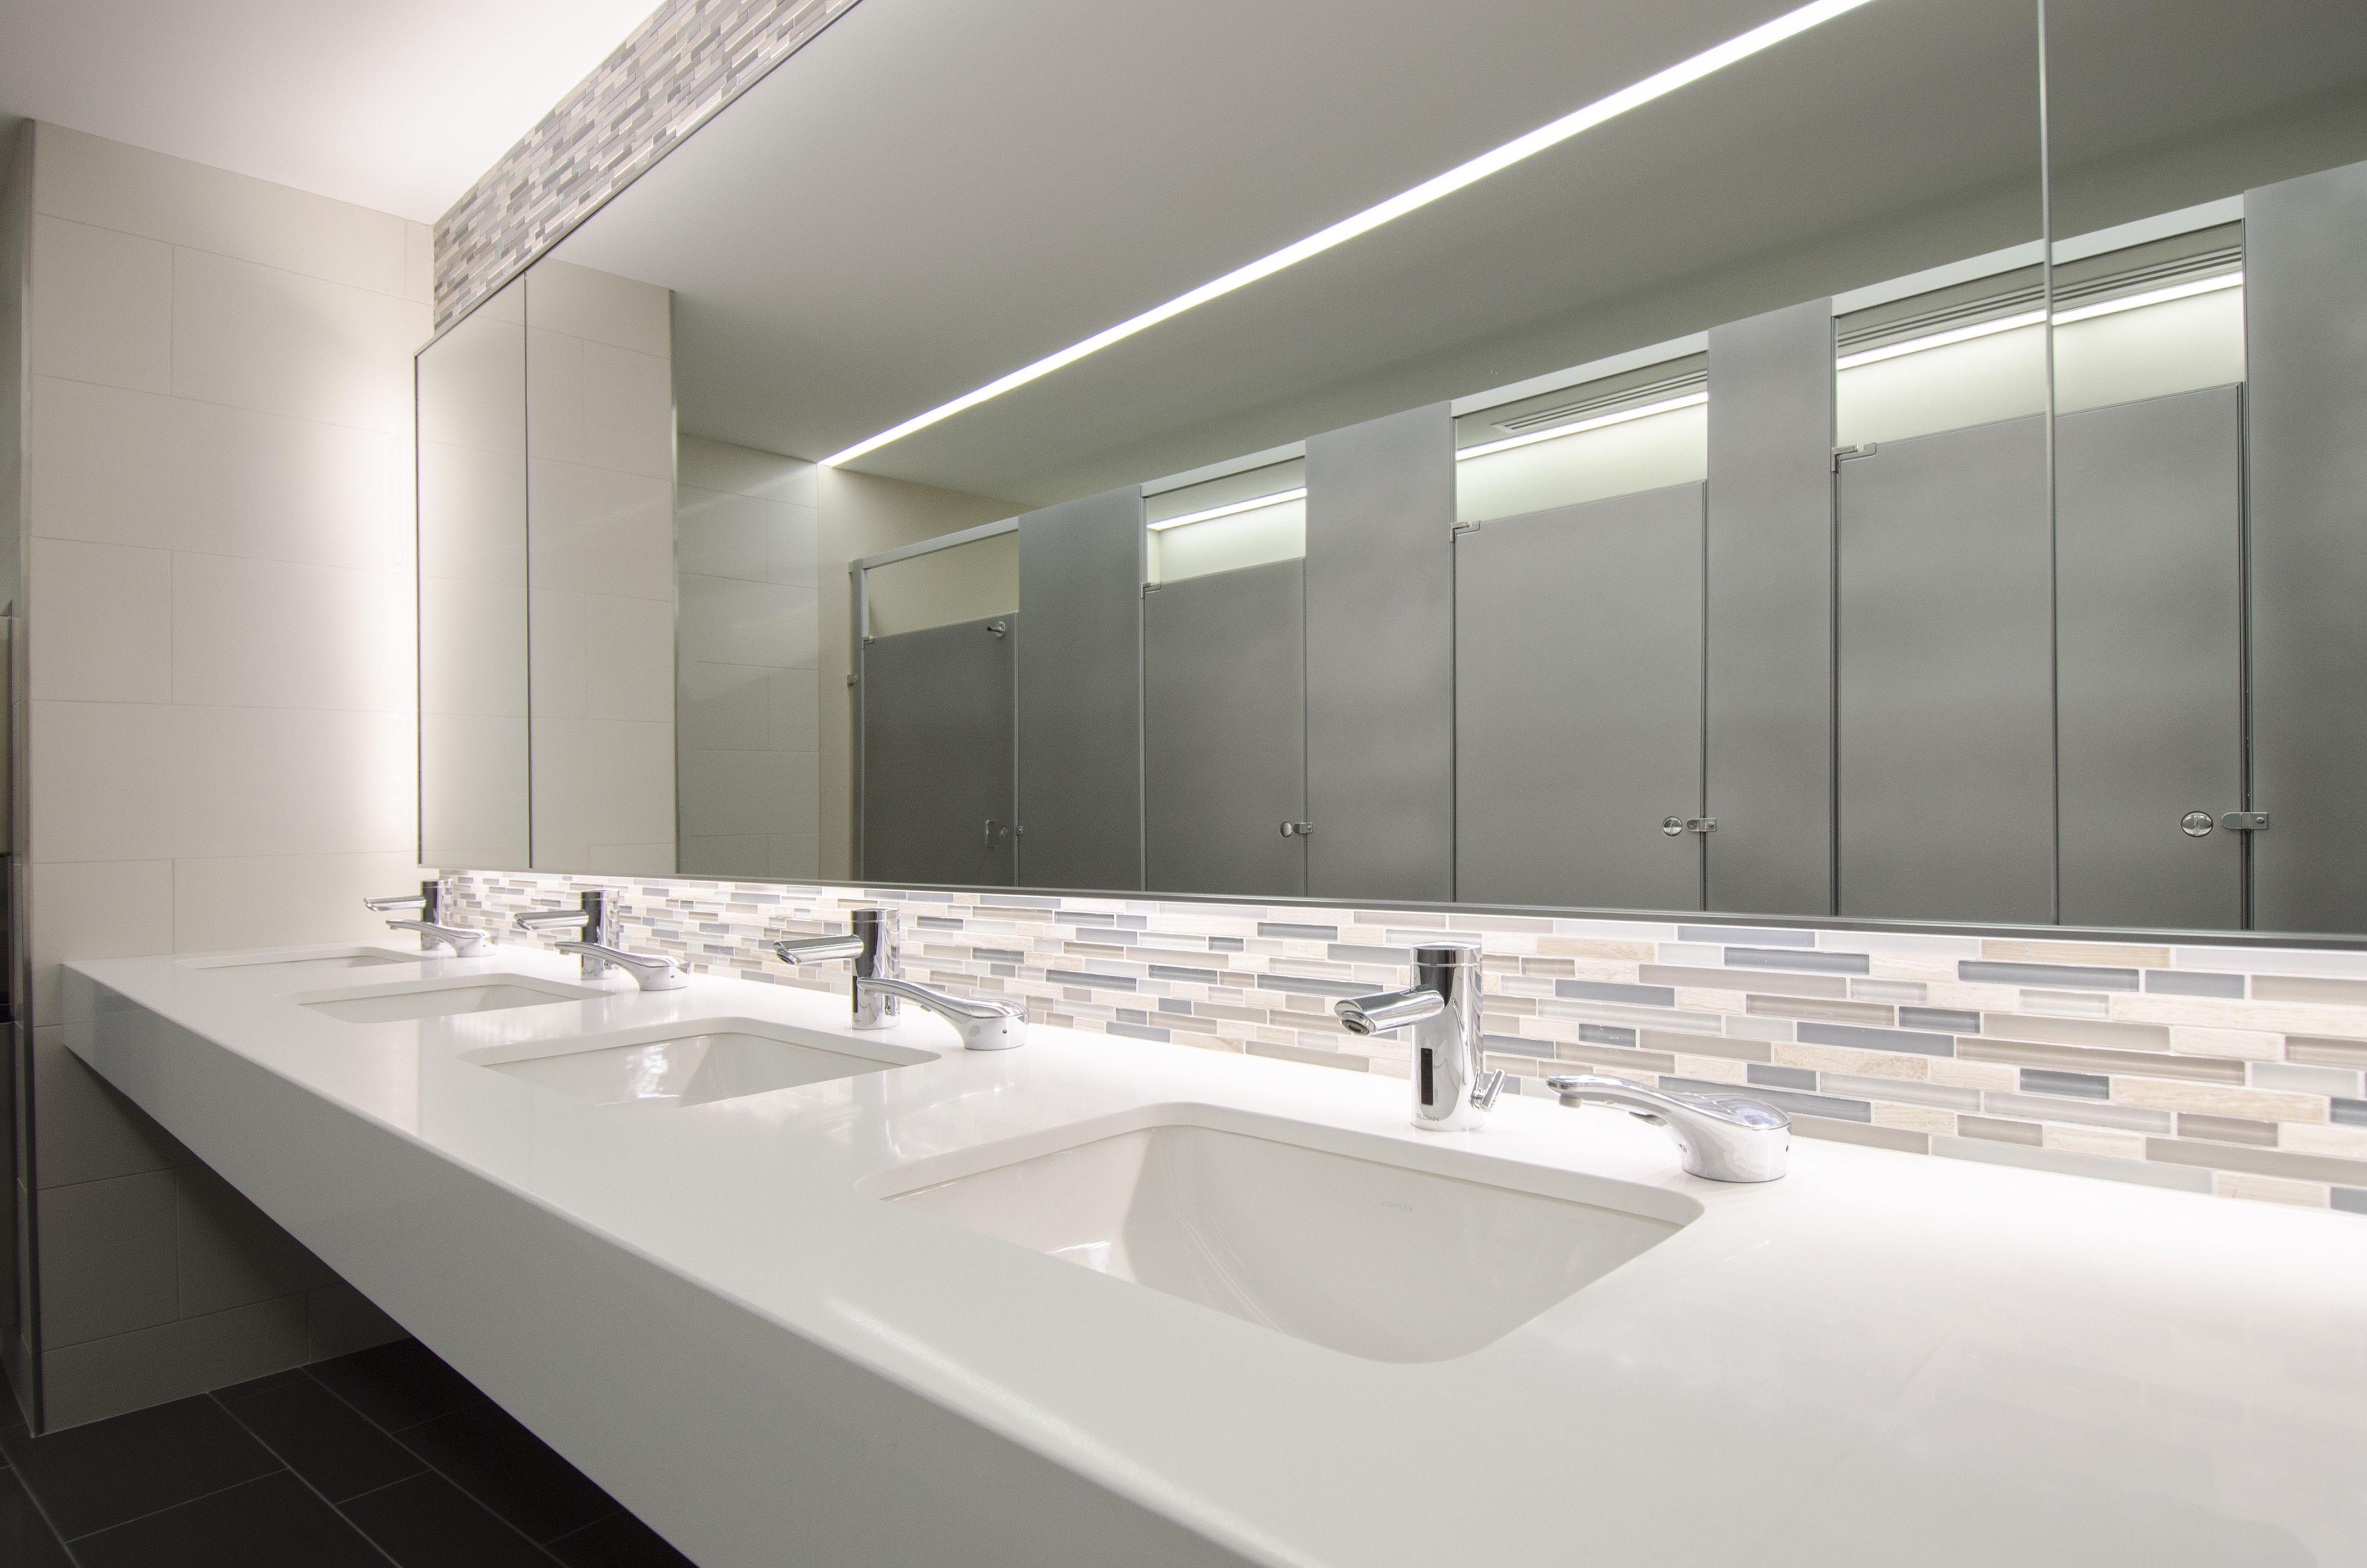 Commercial Restroom Commercial Bathroom Ideas Restroom Design